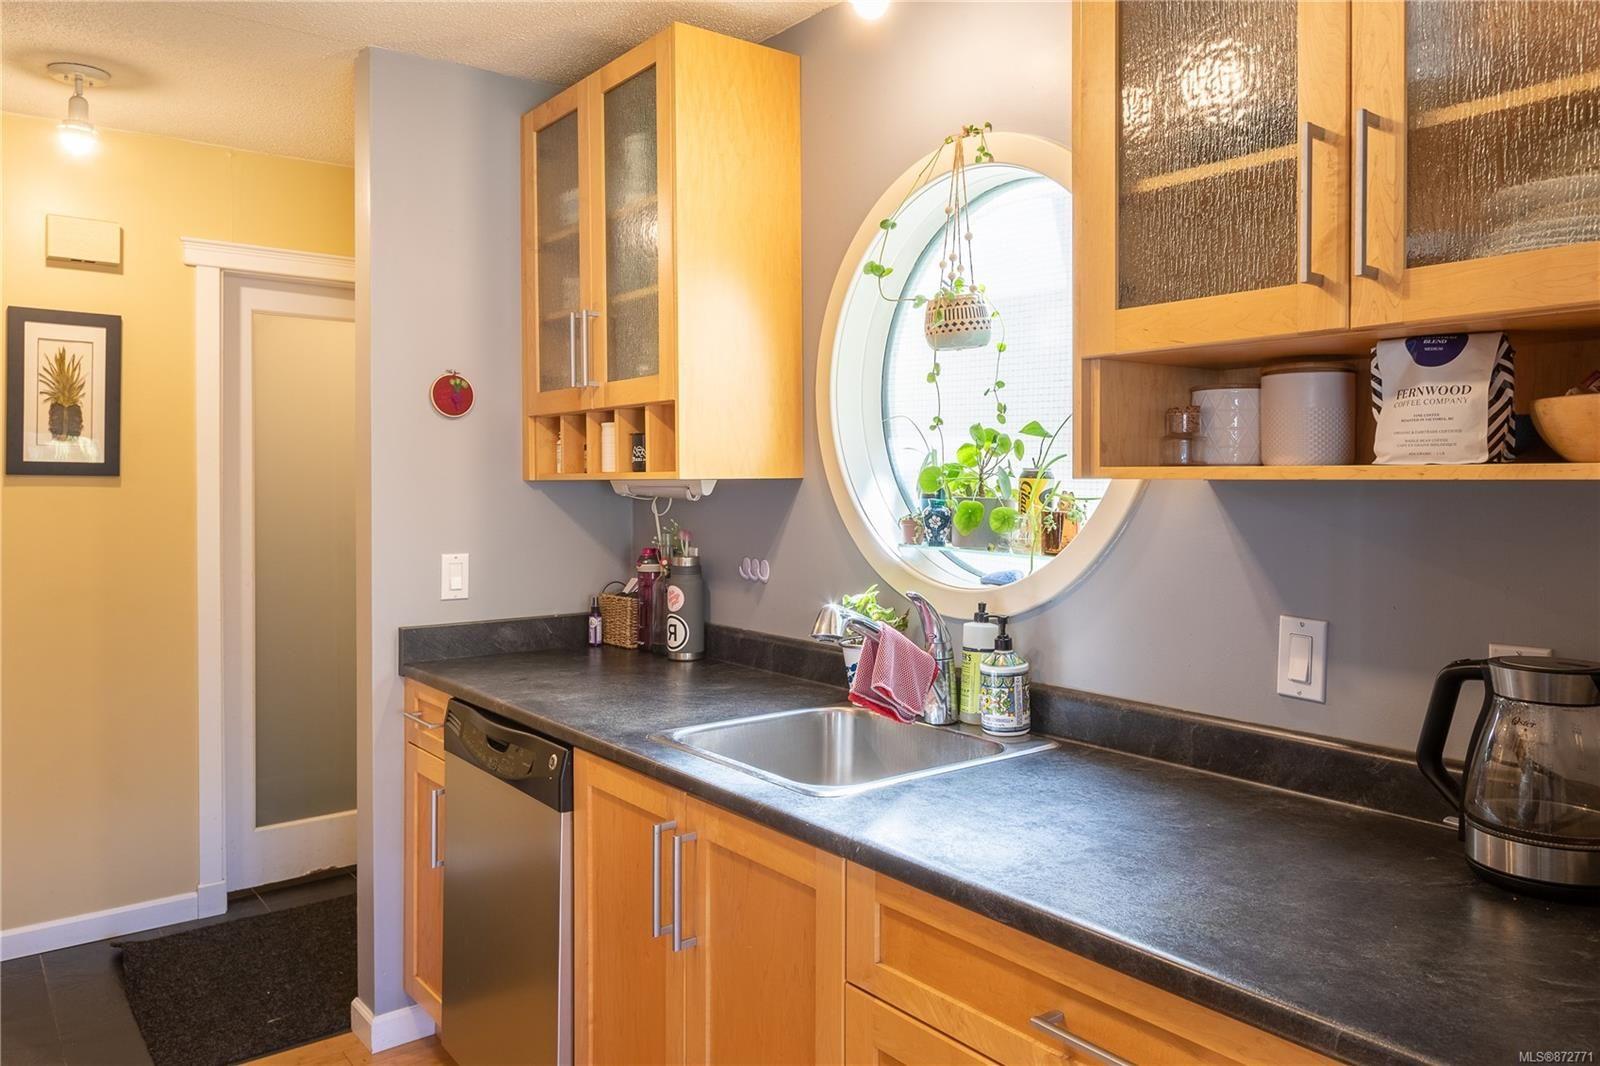 Photo 11: Photos: 305 205 1st St in : CV Courtenay City Condo for sale (Comox Valley)  : MLS®# 872771